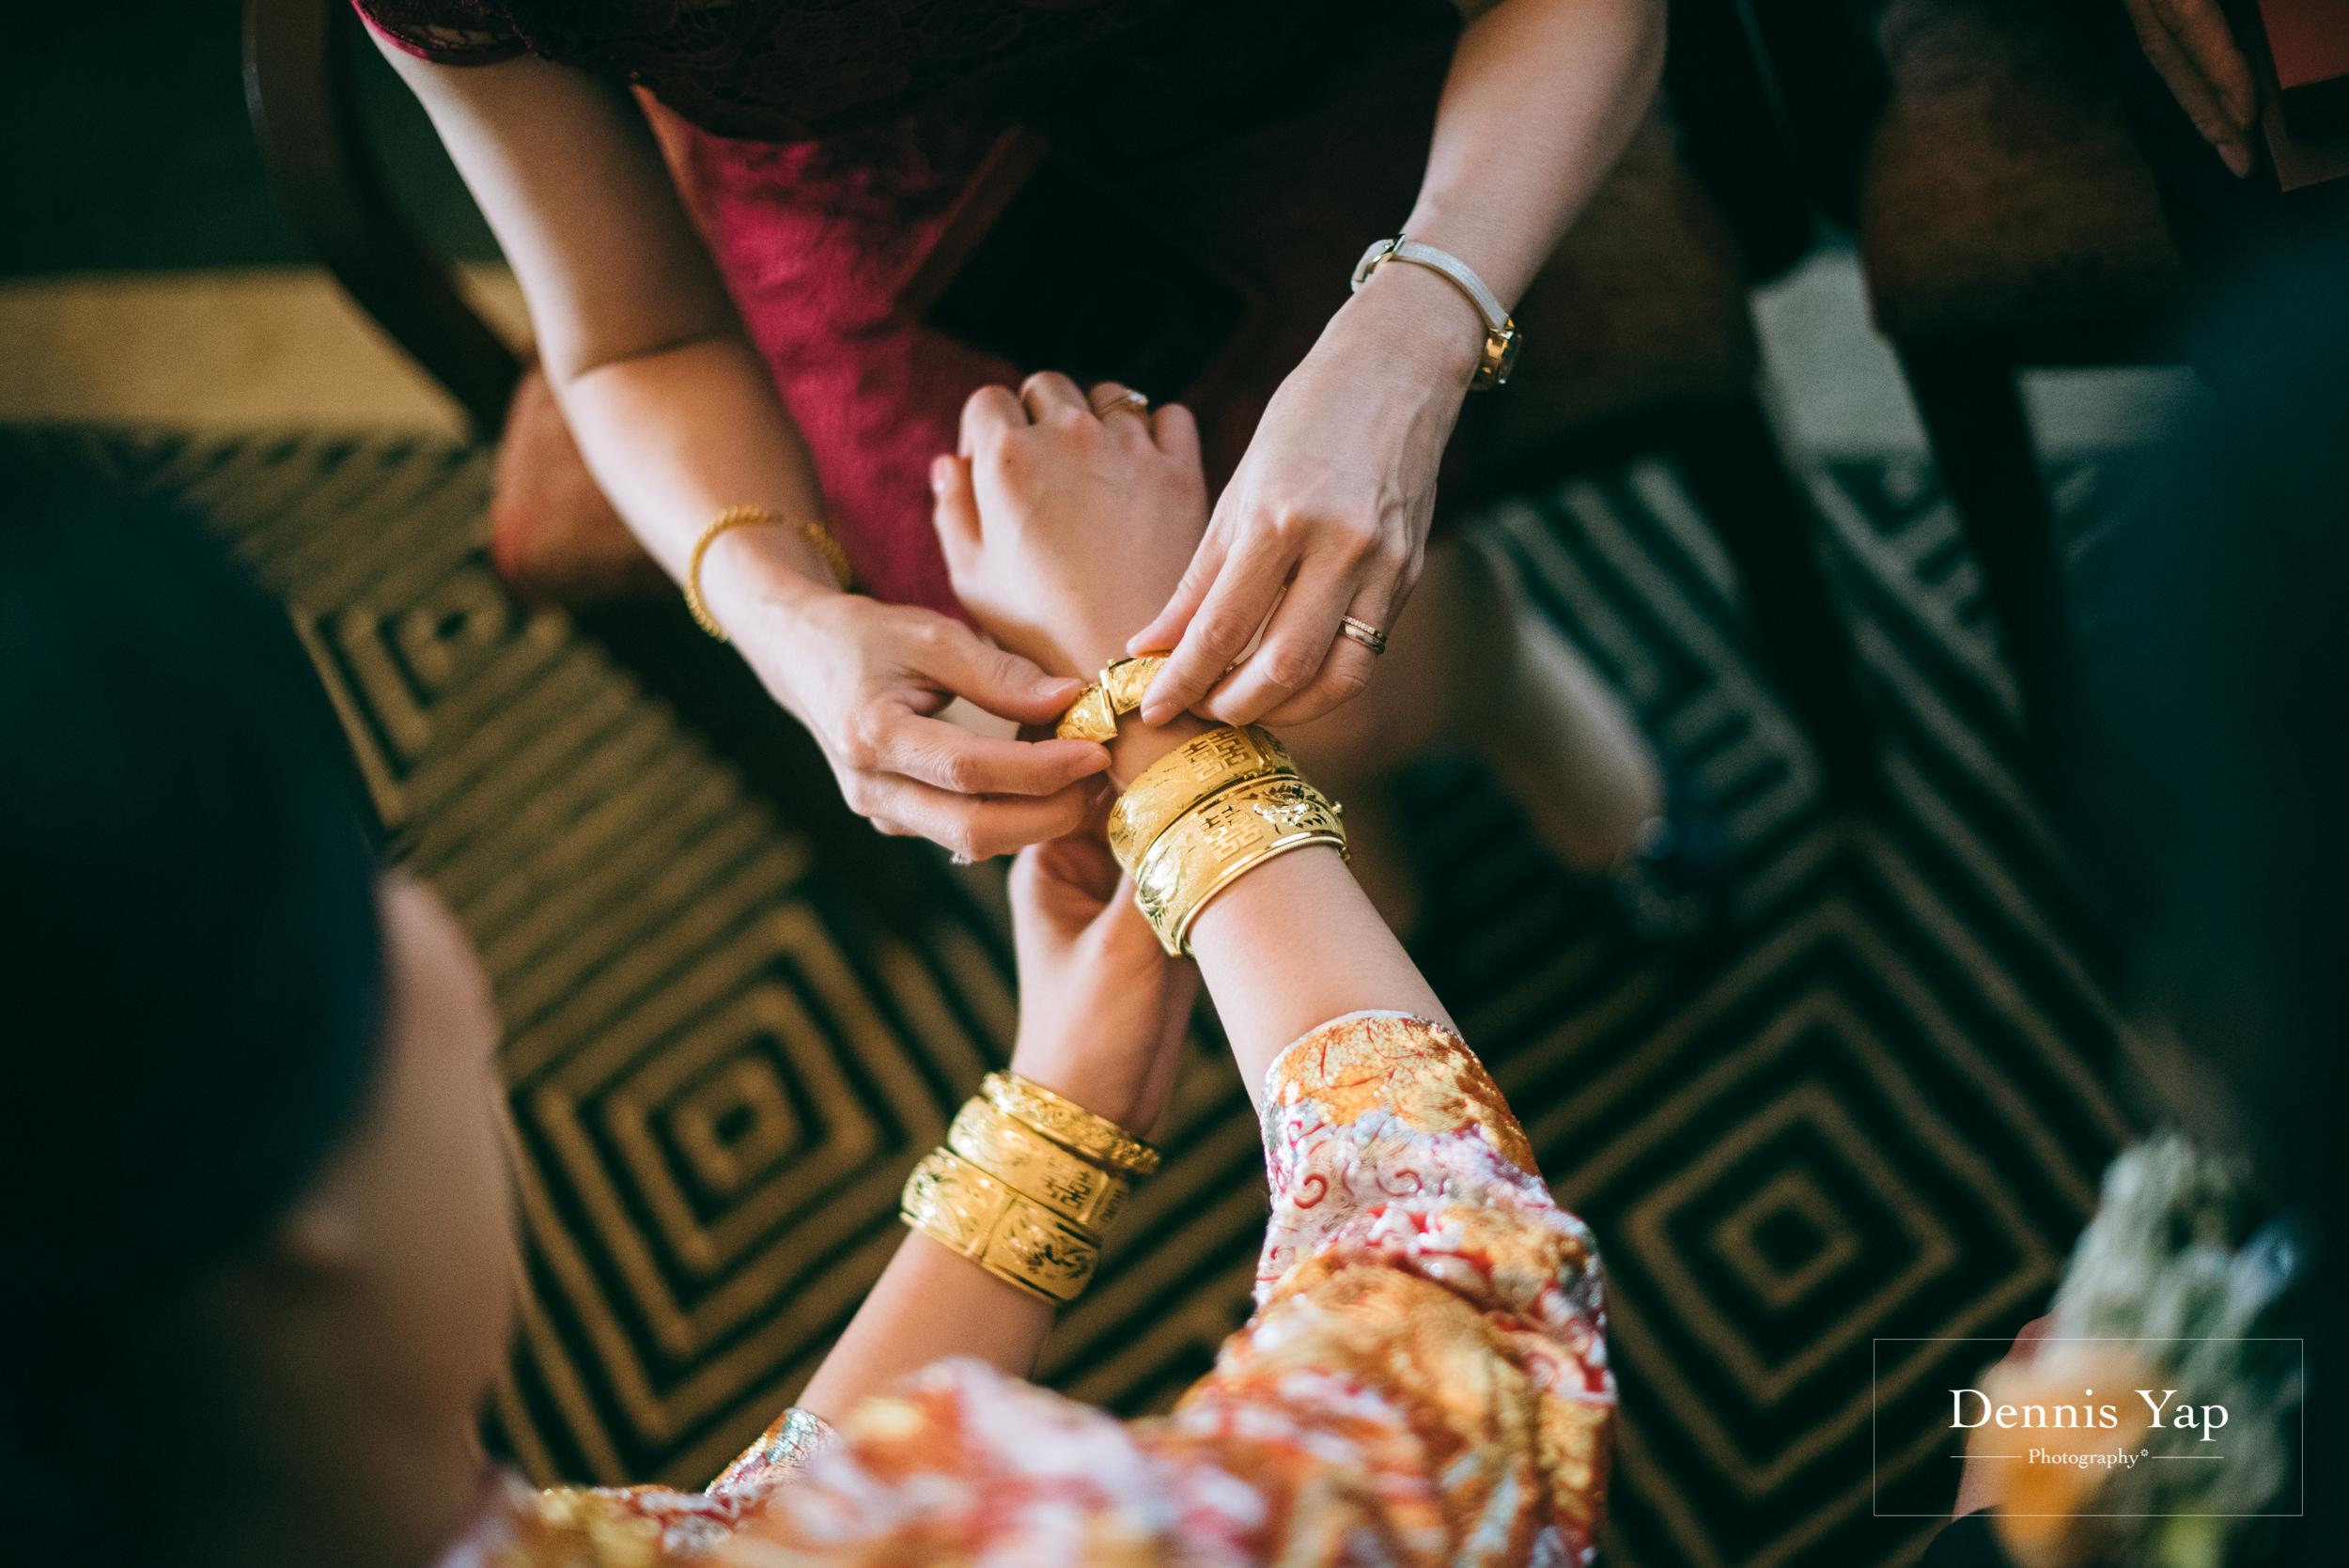 wai keong jenny wedding day bangsar dennis yap photography emotions beloved family-15.jpg